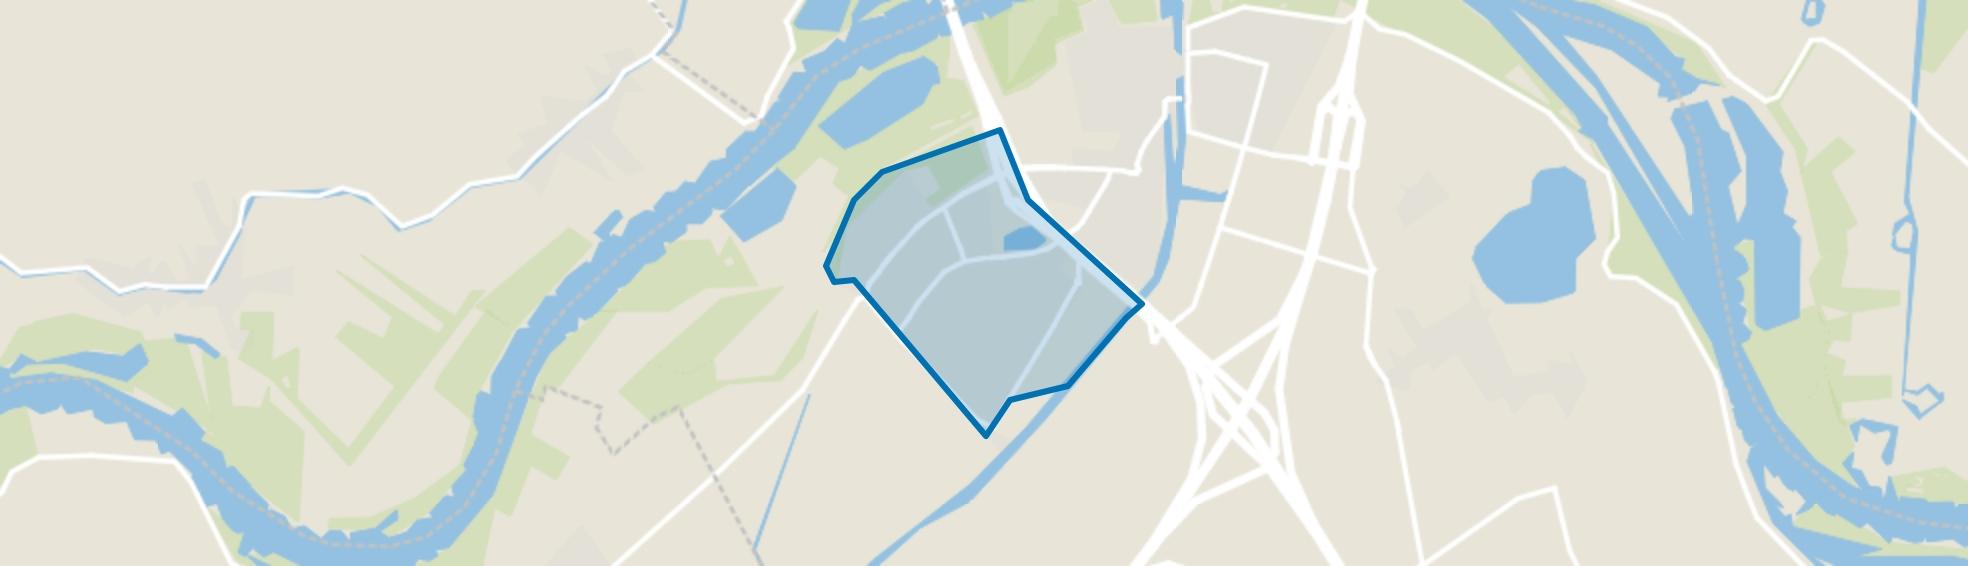 Monnikenhof en Amaliastein, Vianen (UT) map